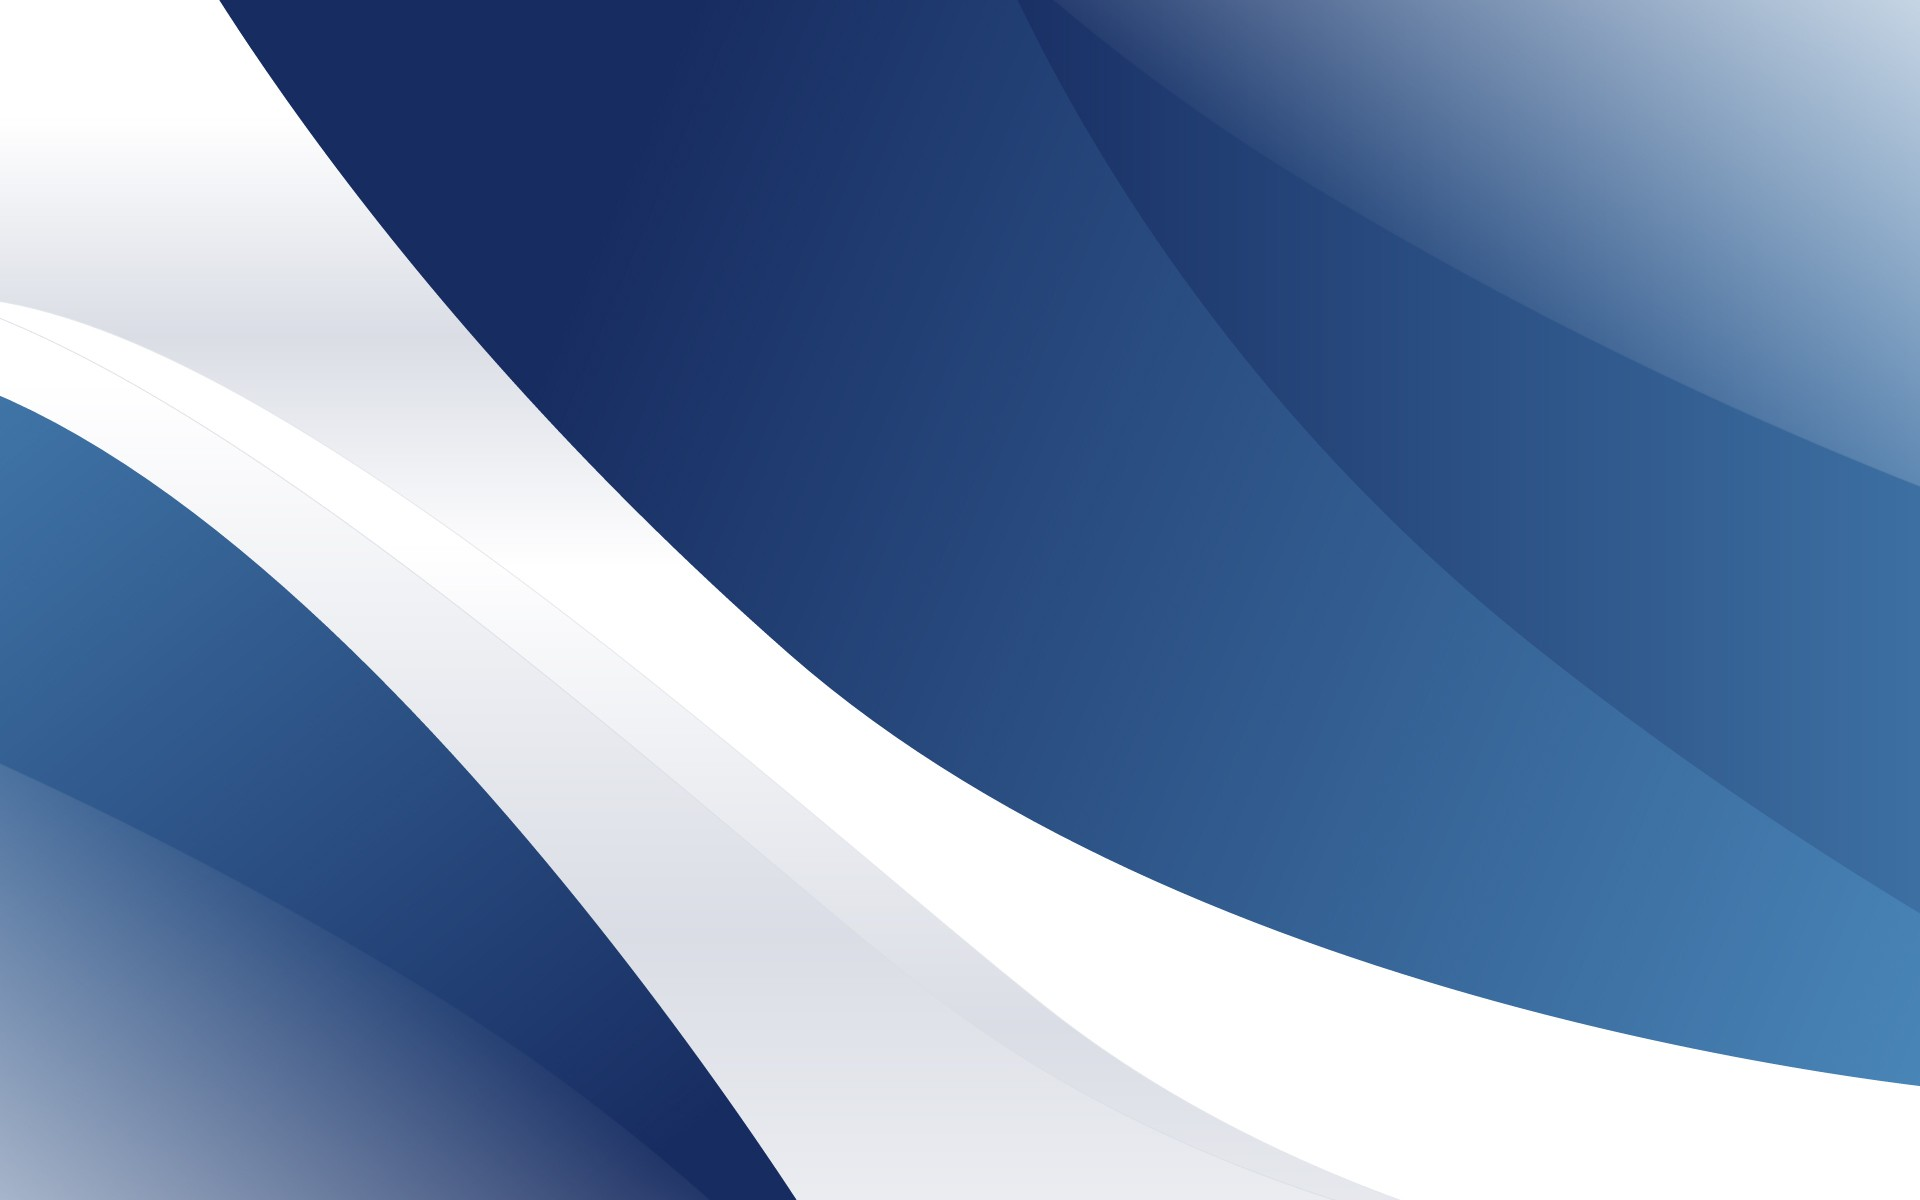 Free HD Light Blue Wallpaper